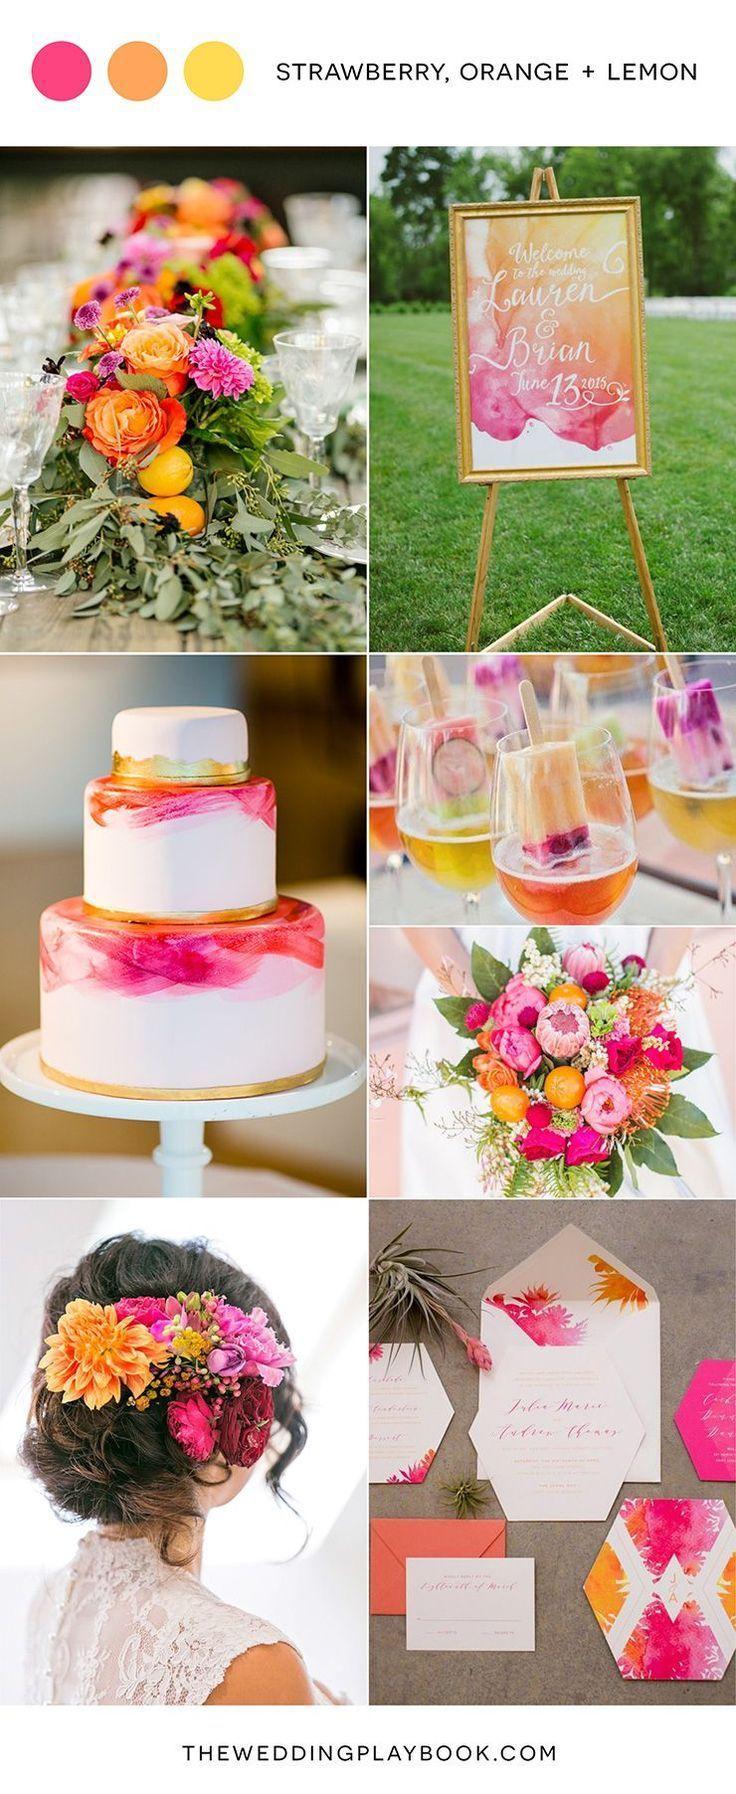 Leaving Facebook #moodboards Strawberry Orange and Lemon Marriage ceremony Inspiration #inspiration #lemon #orange